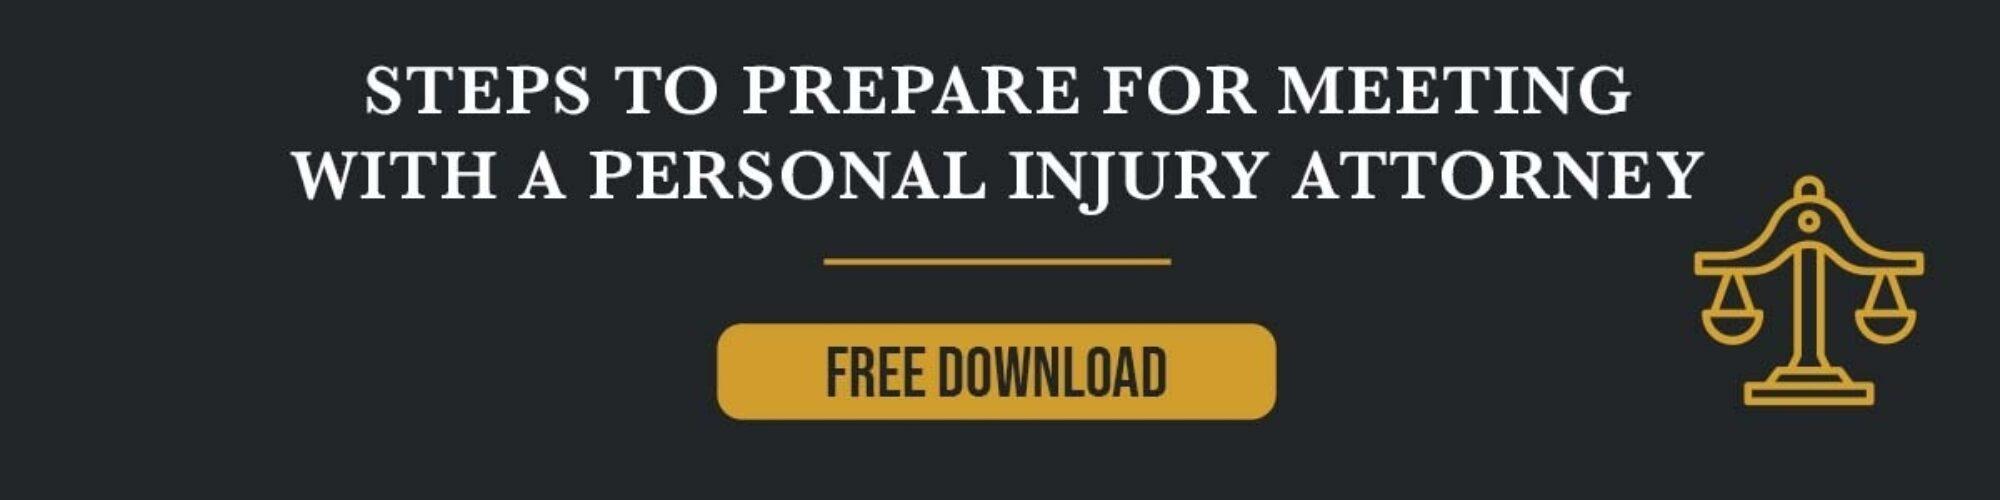 Personal Injury Steps CTA